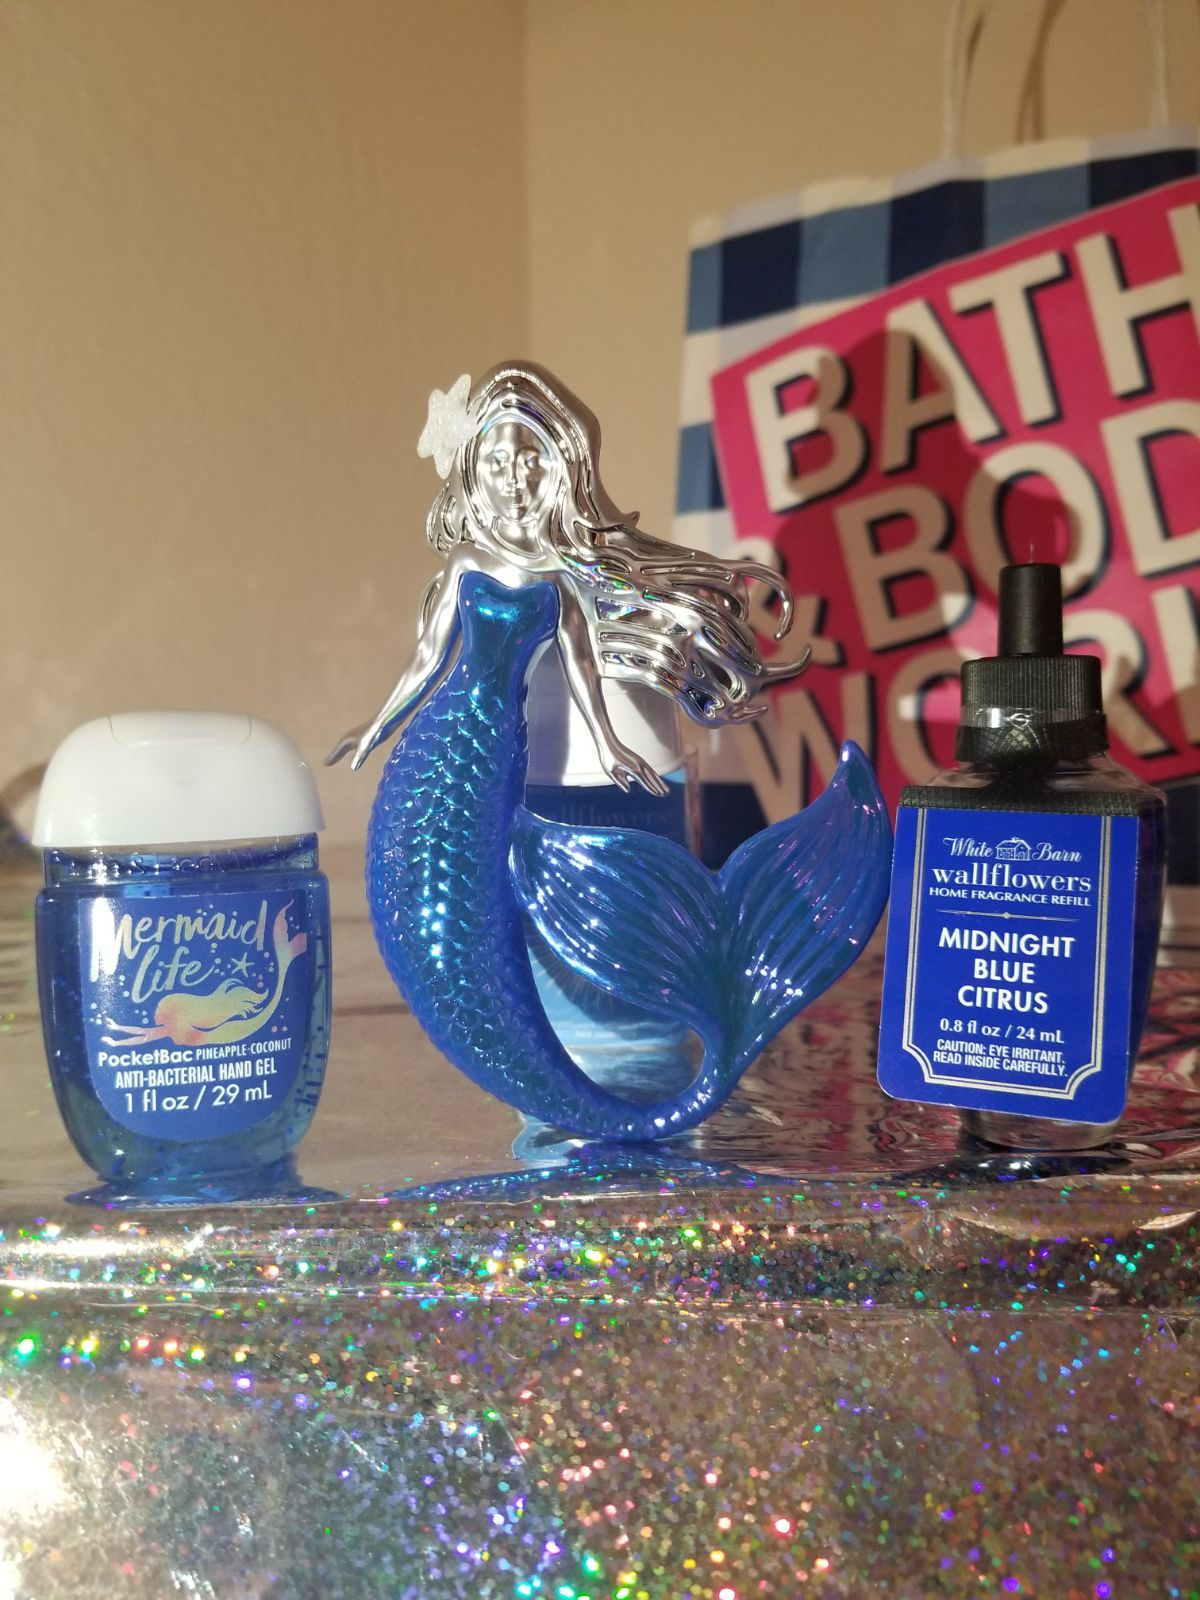 Beautiful Mermaid Wallflower Nightlight Mermaid Life Pocketbac